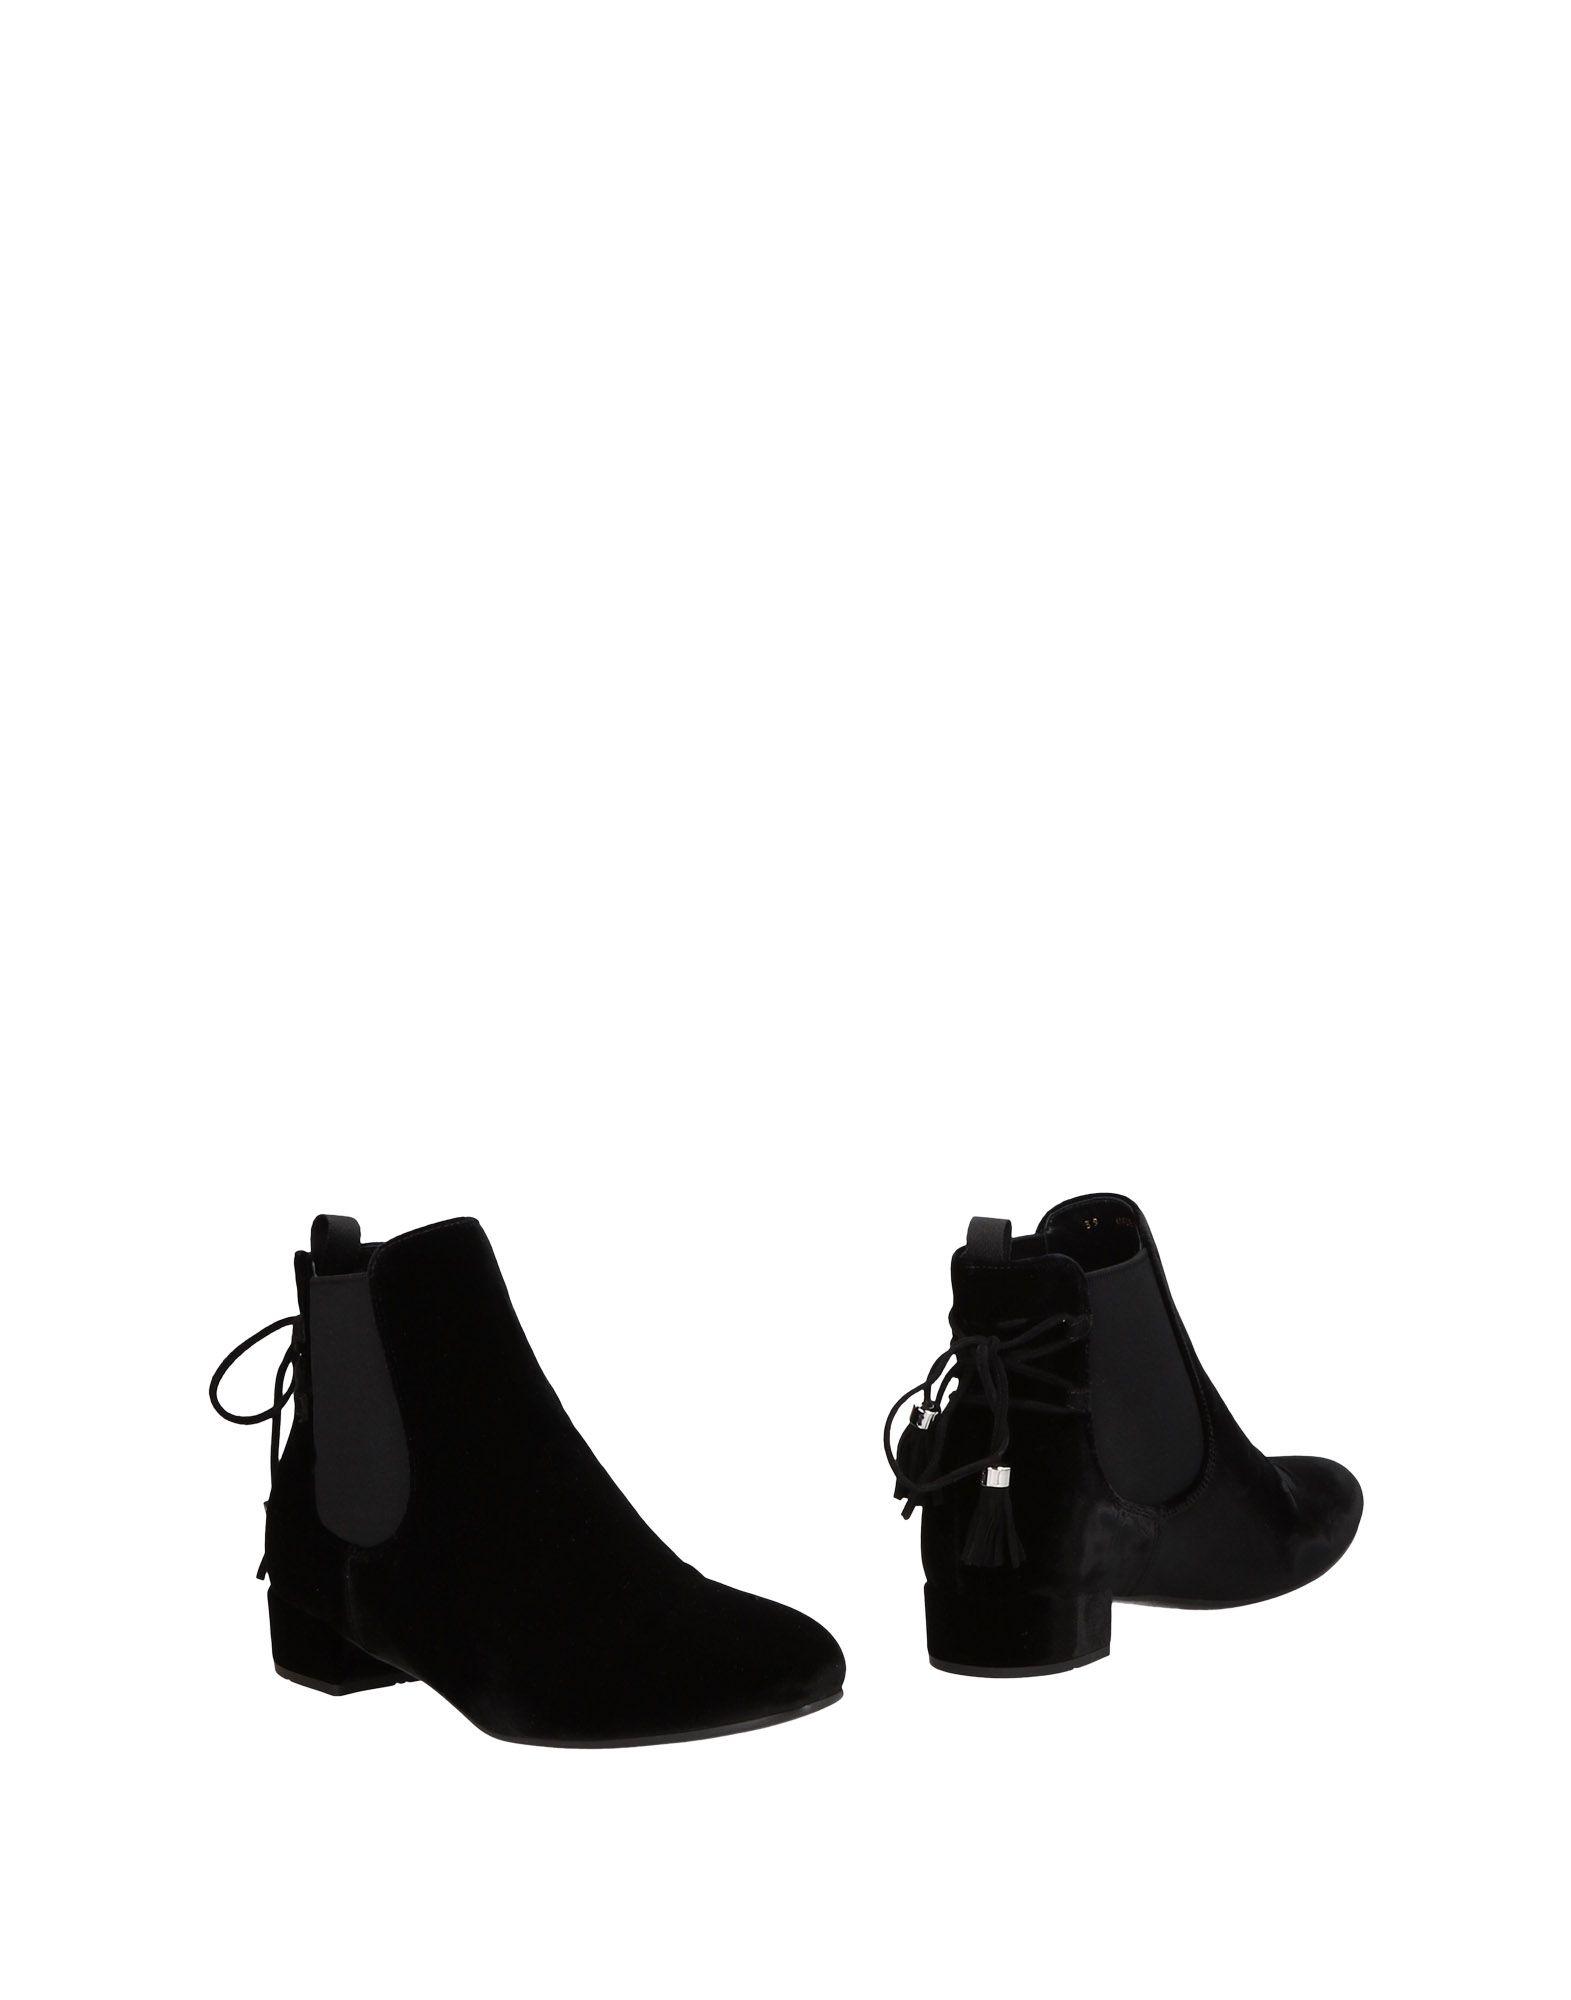 Prada Ankle Boot - Women Prada  Ankle Boots online on  Prada United Kingdom - 11465764LA b9a41e